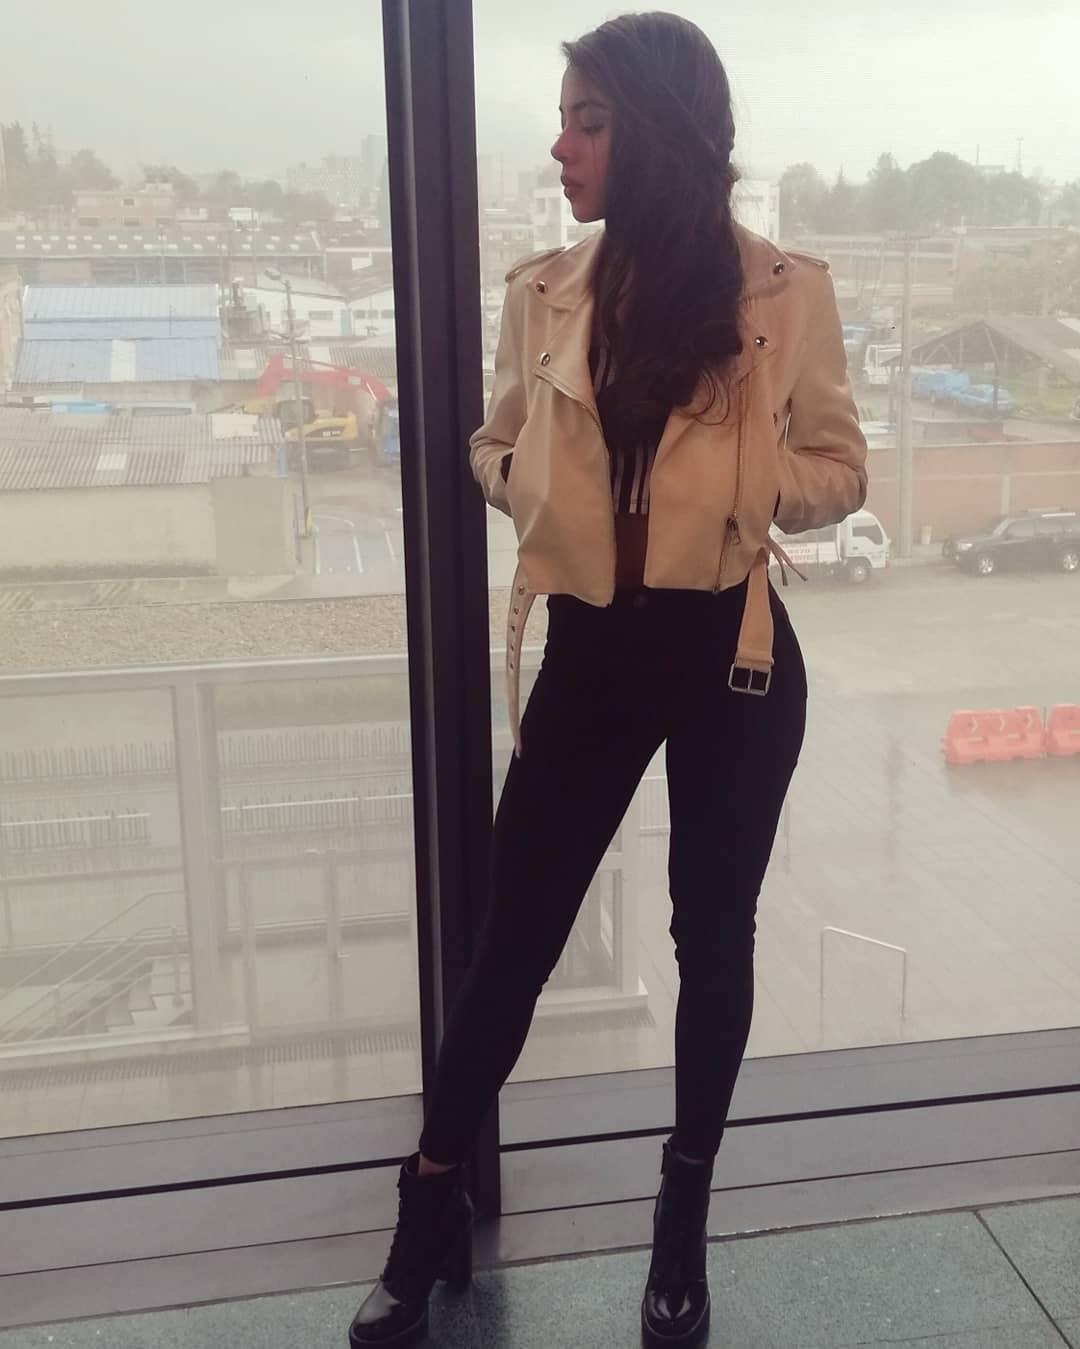 gina aguirre, virreyna de miss latinoamerica 2019. 54511812